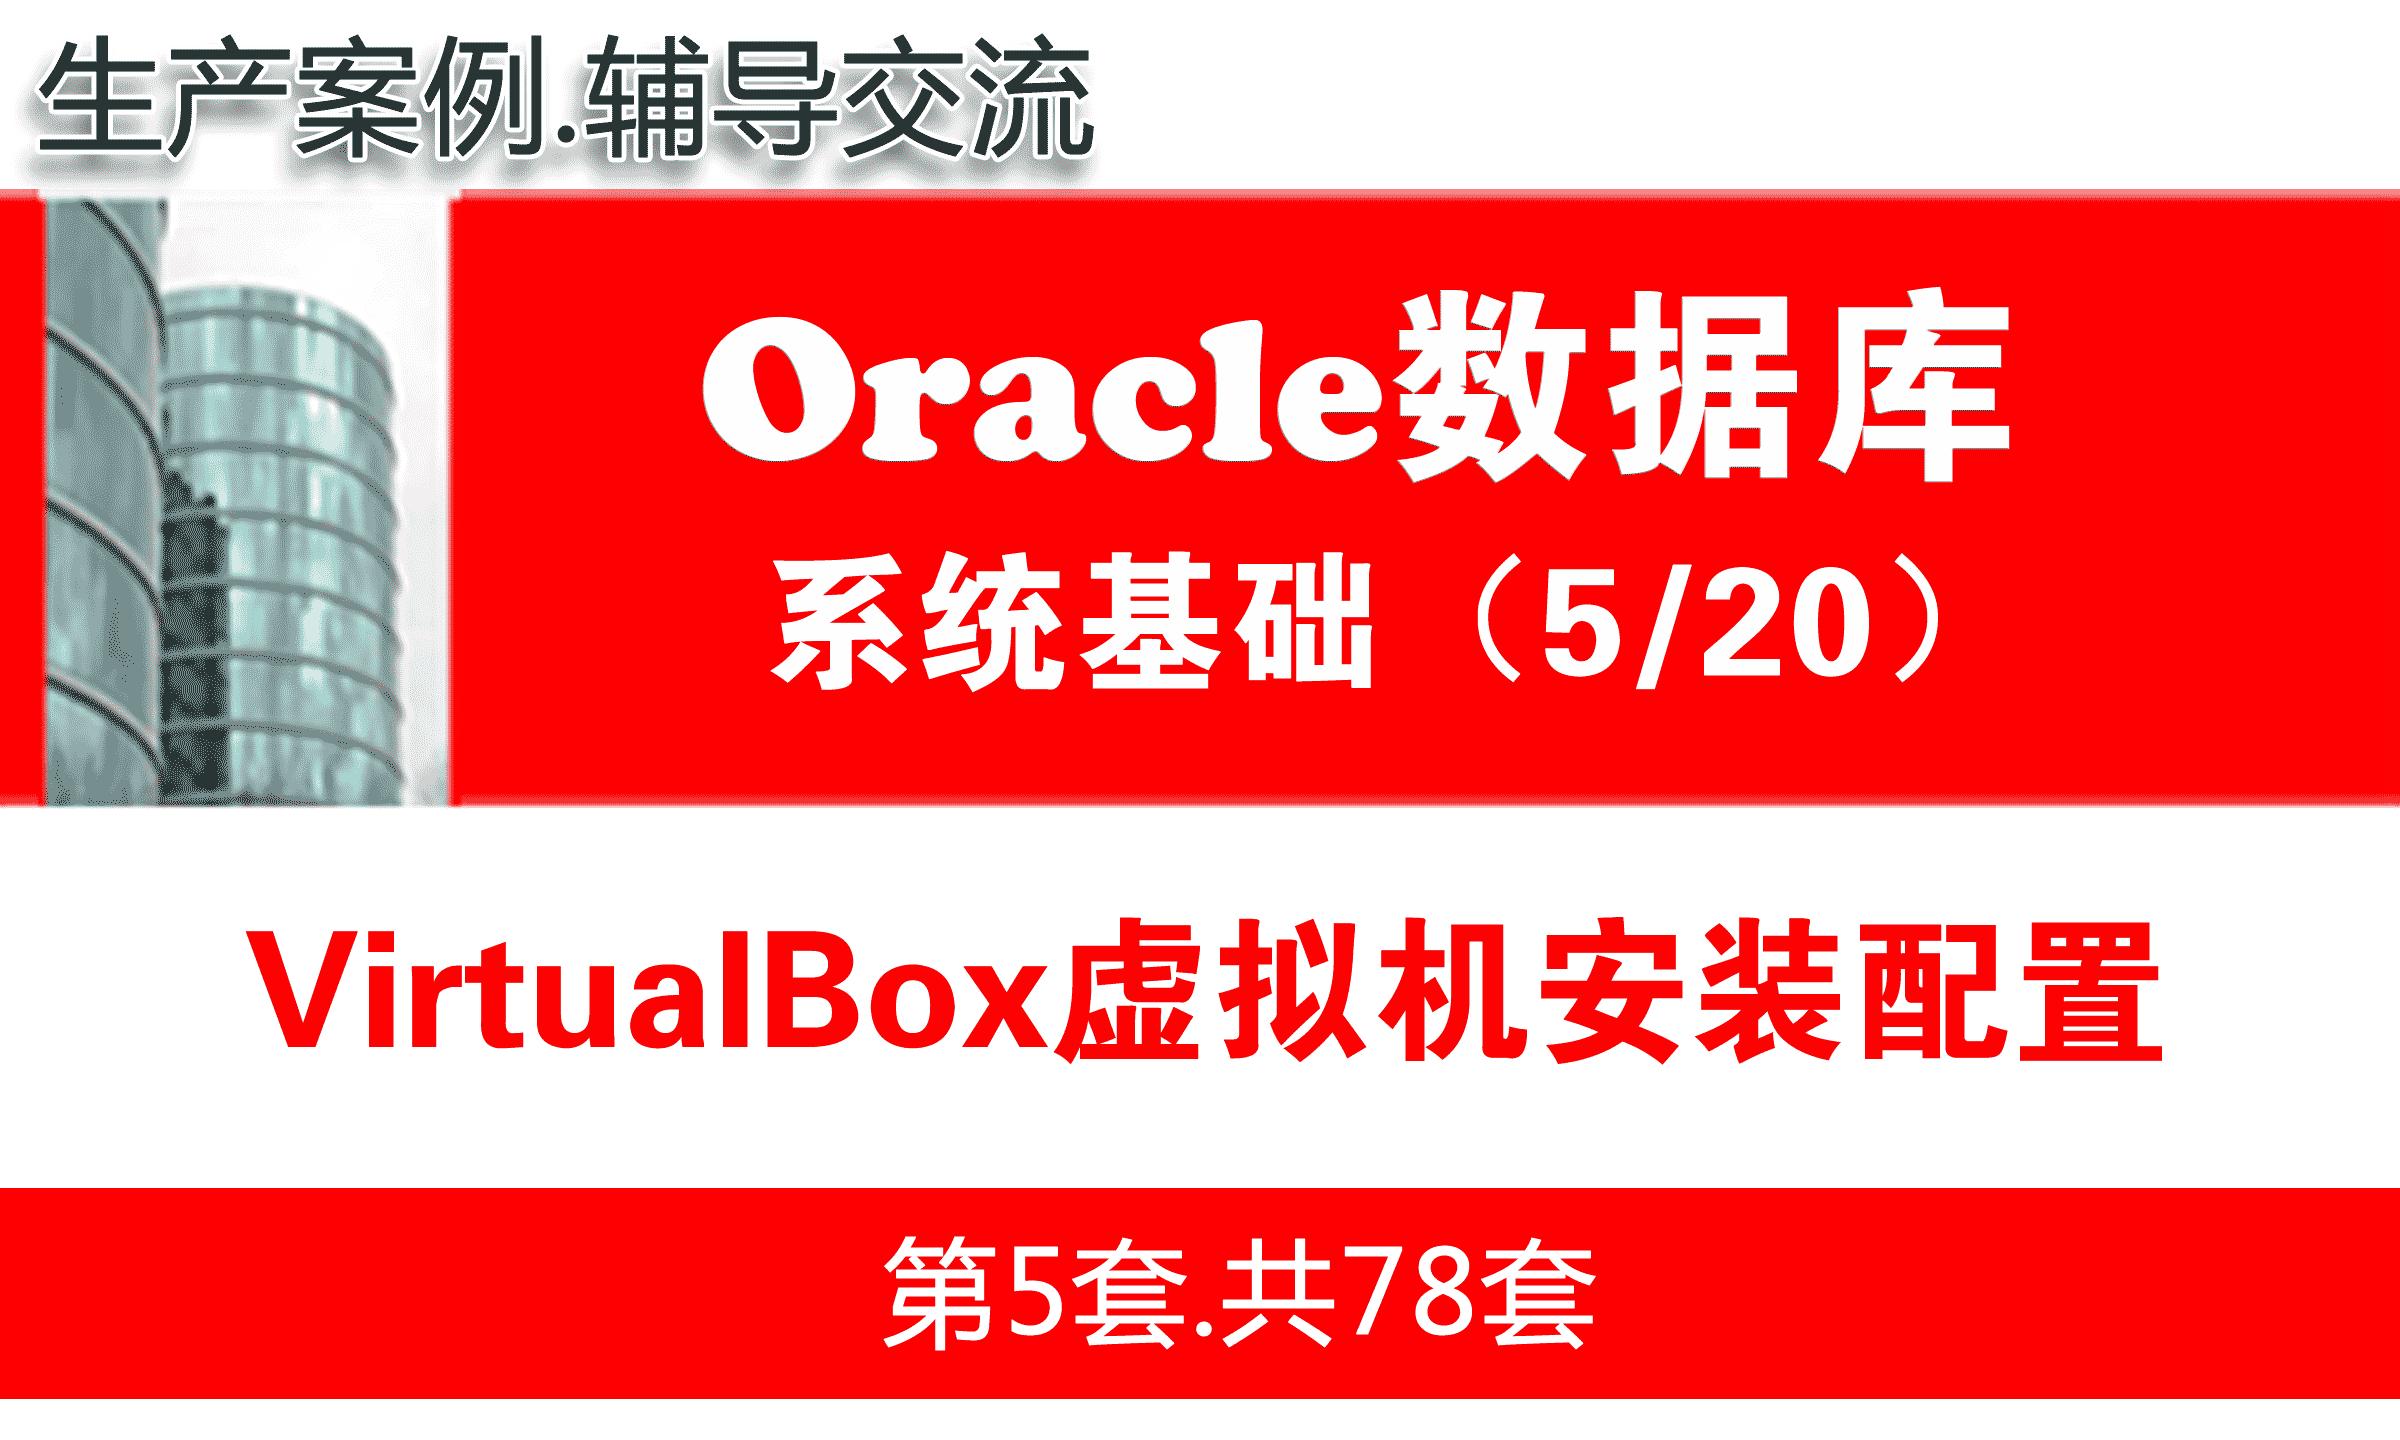 VirtualBox虚拟机安装配置_Oracle数据库入门系列教程05